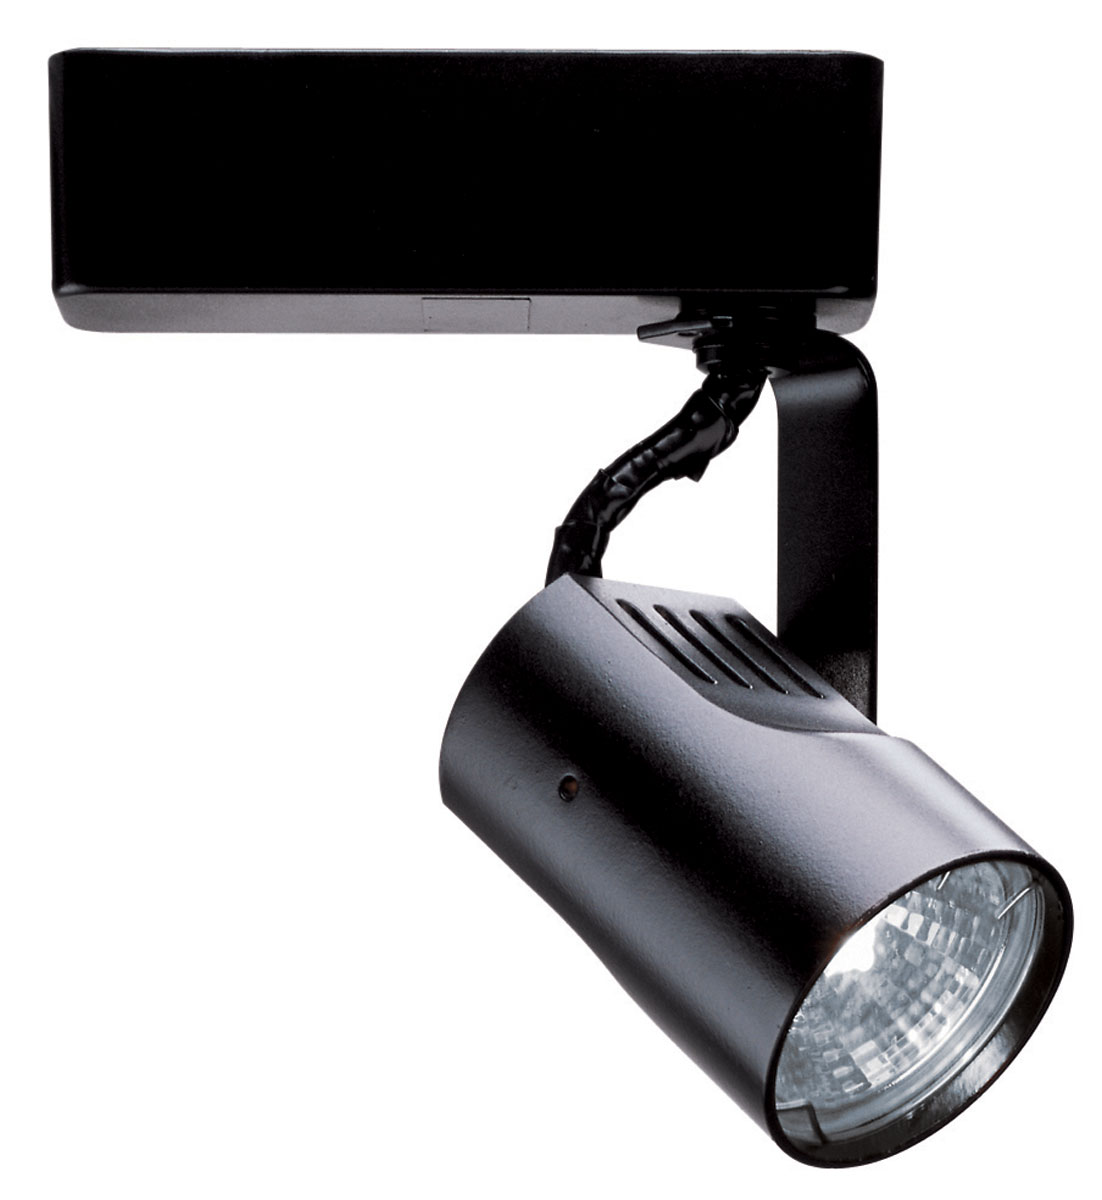 Low Voltage Indoor Lighting Systems: R740 MR16 Pinchback Track Fixture 12V By Juno Lighting